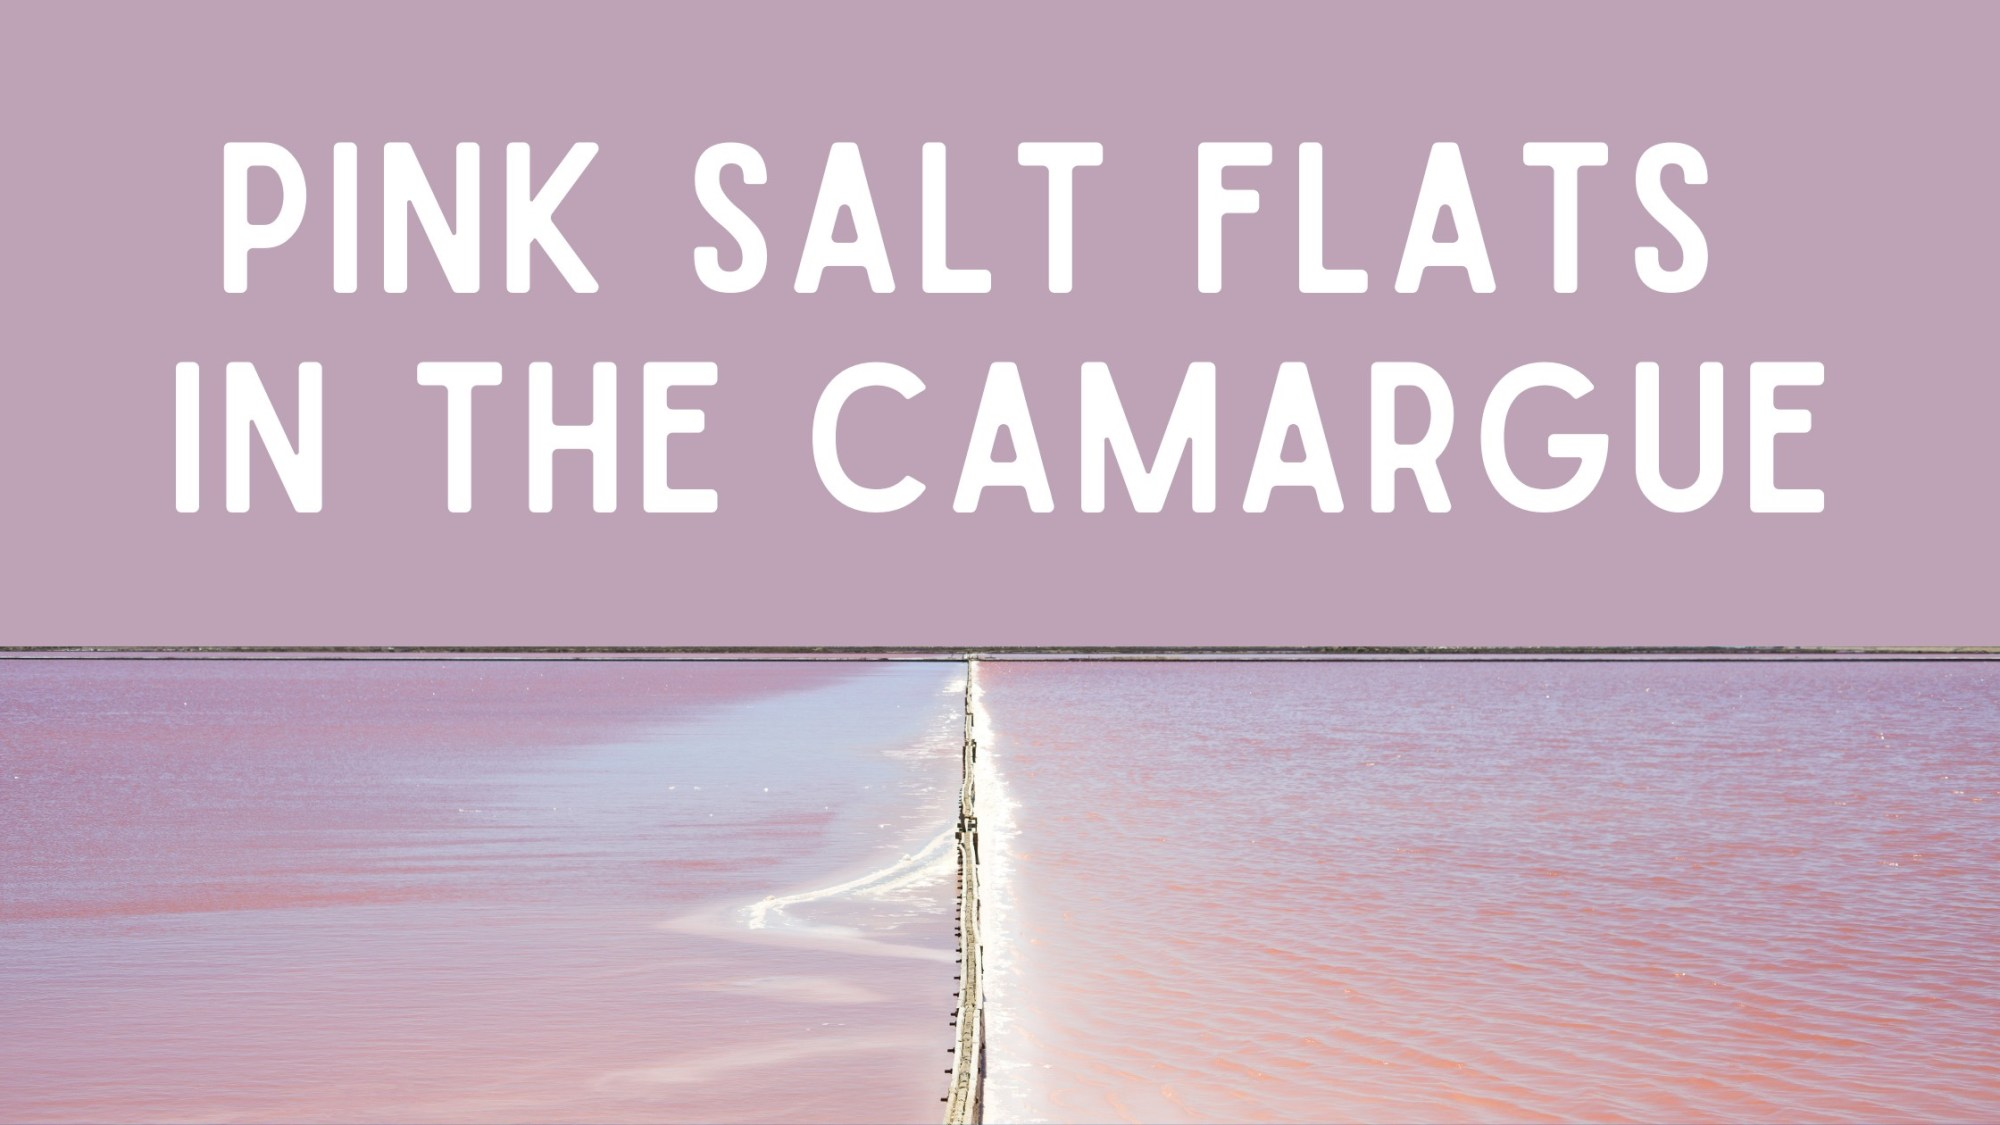 pink salt flats in the camargue region of france